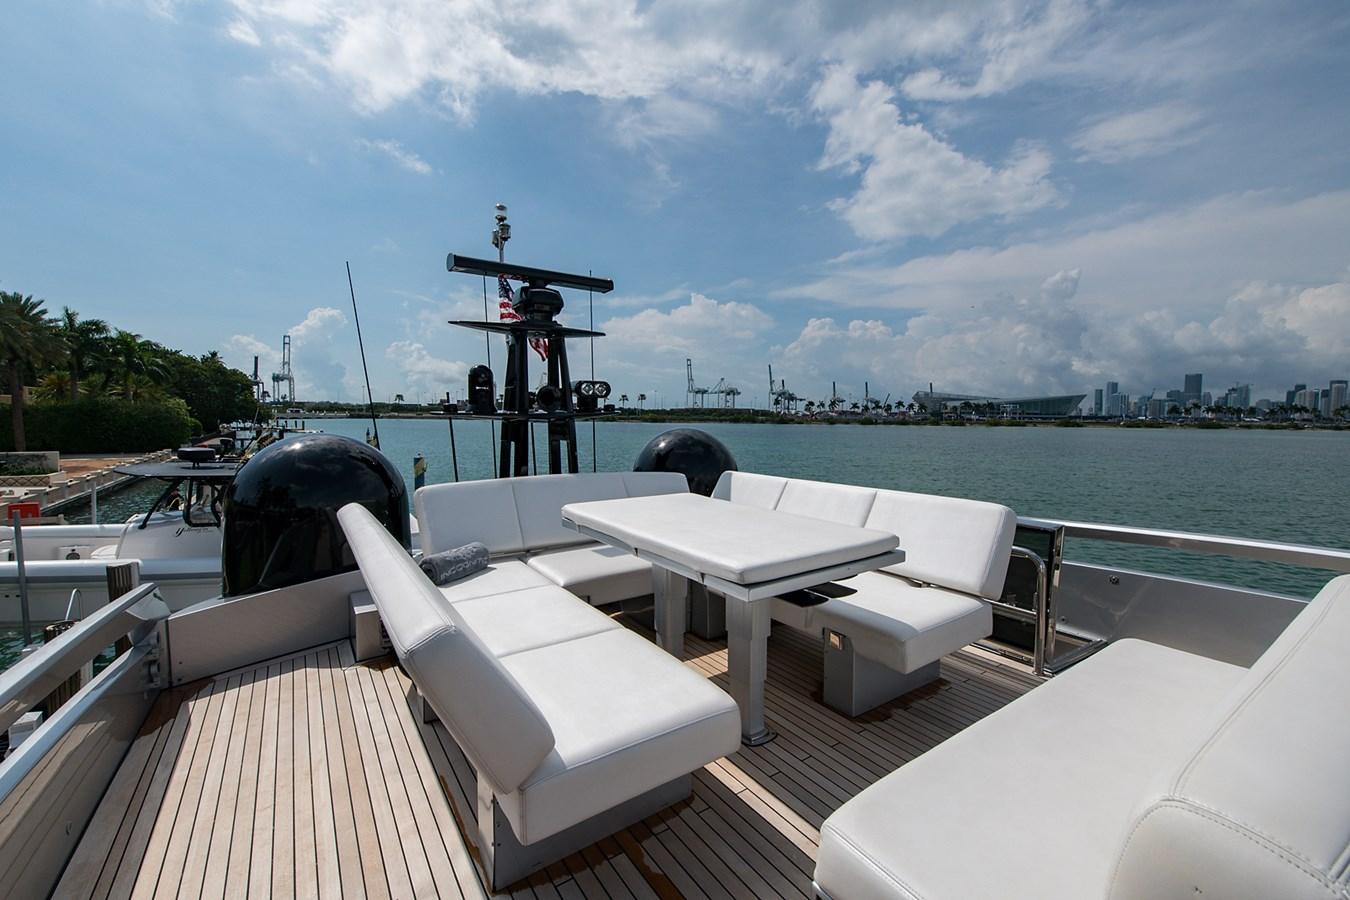 Incognito_Bridge3 2012 PERSHING  Motor Yacht 2810300